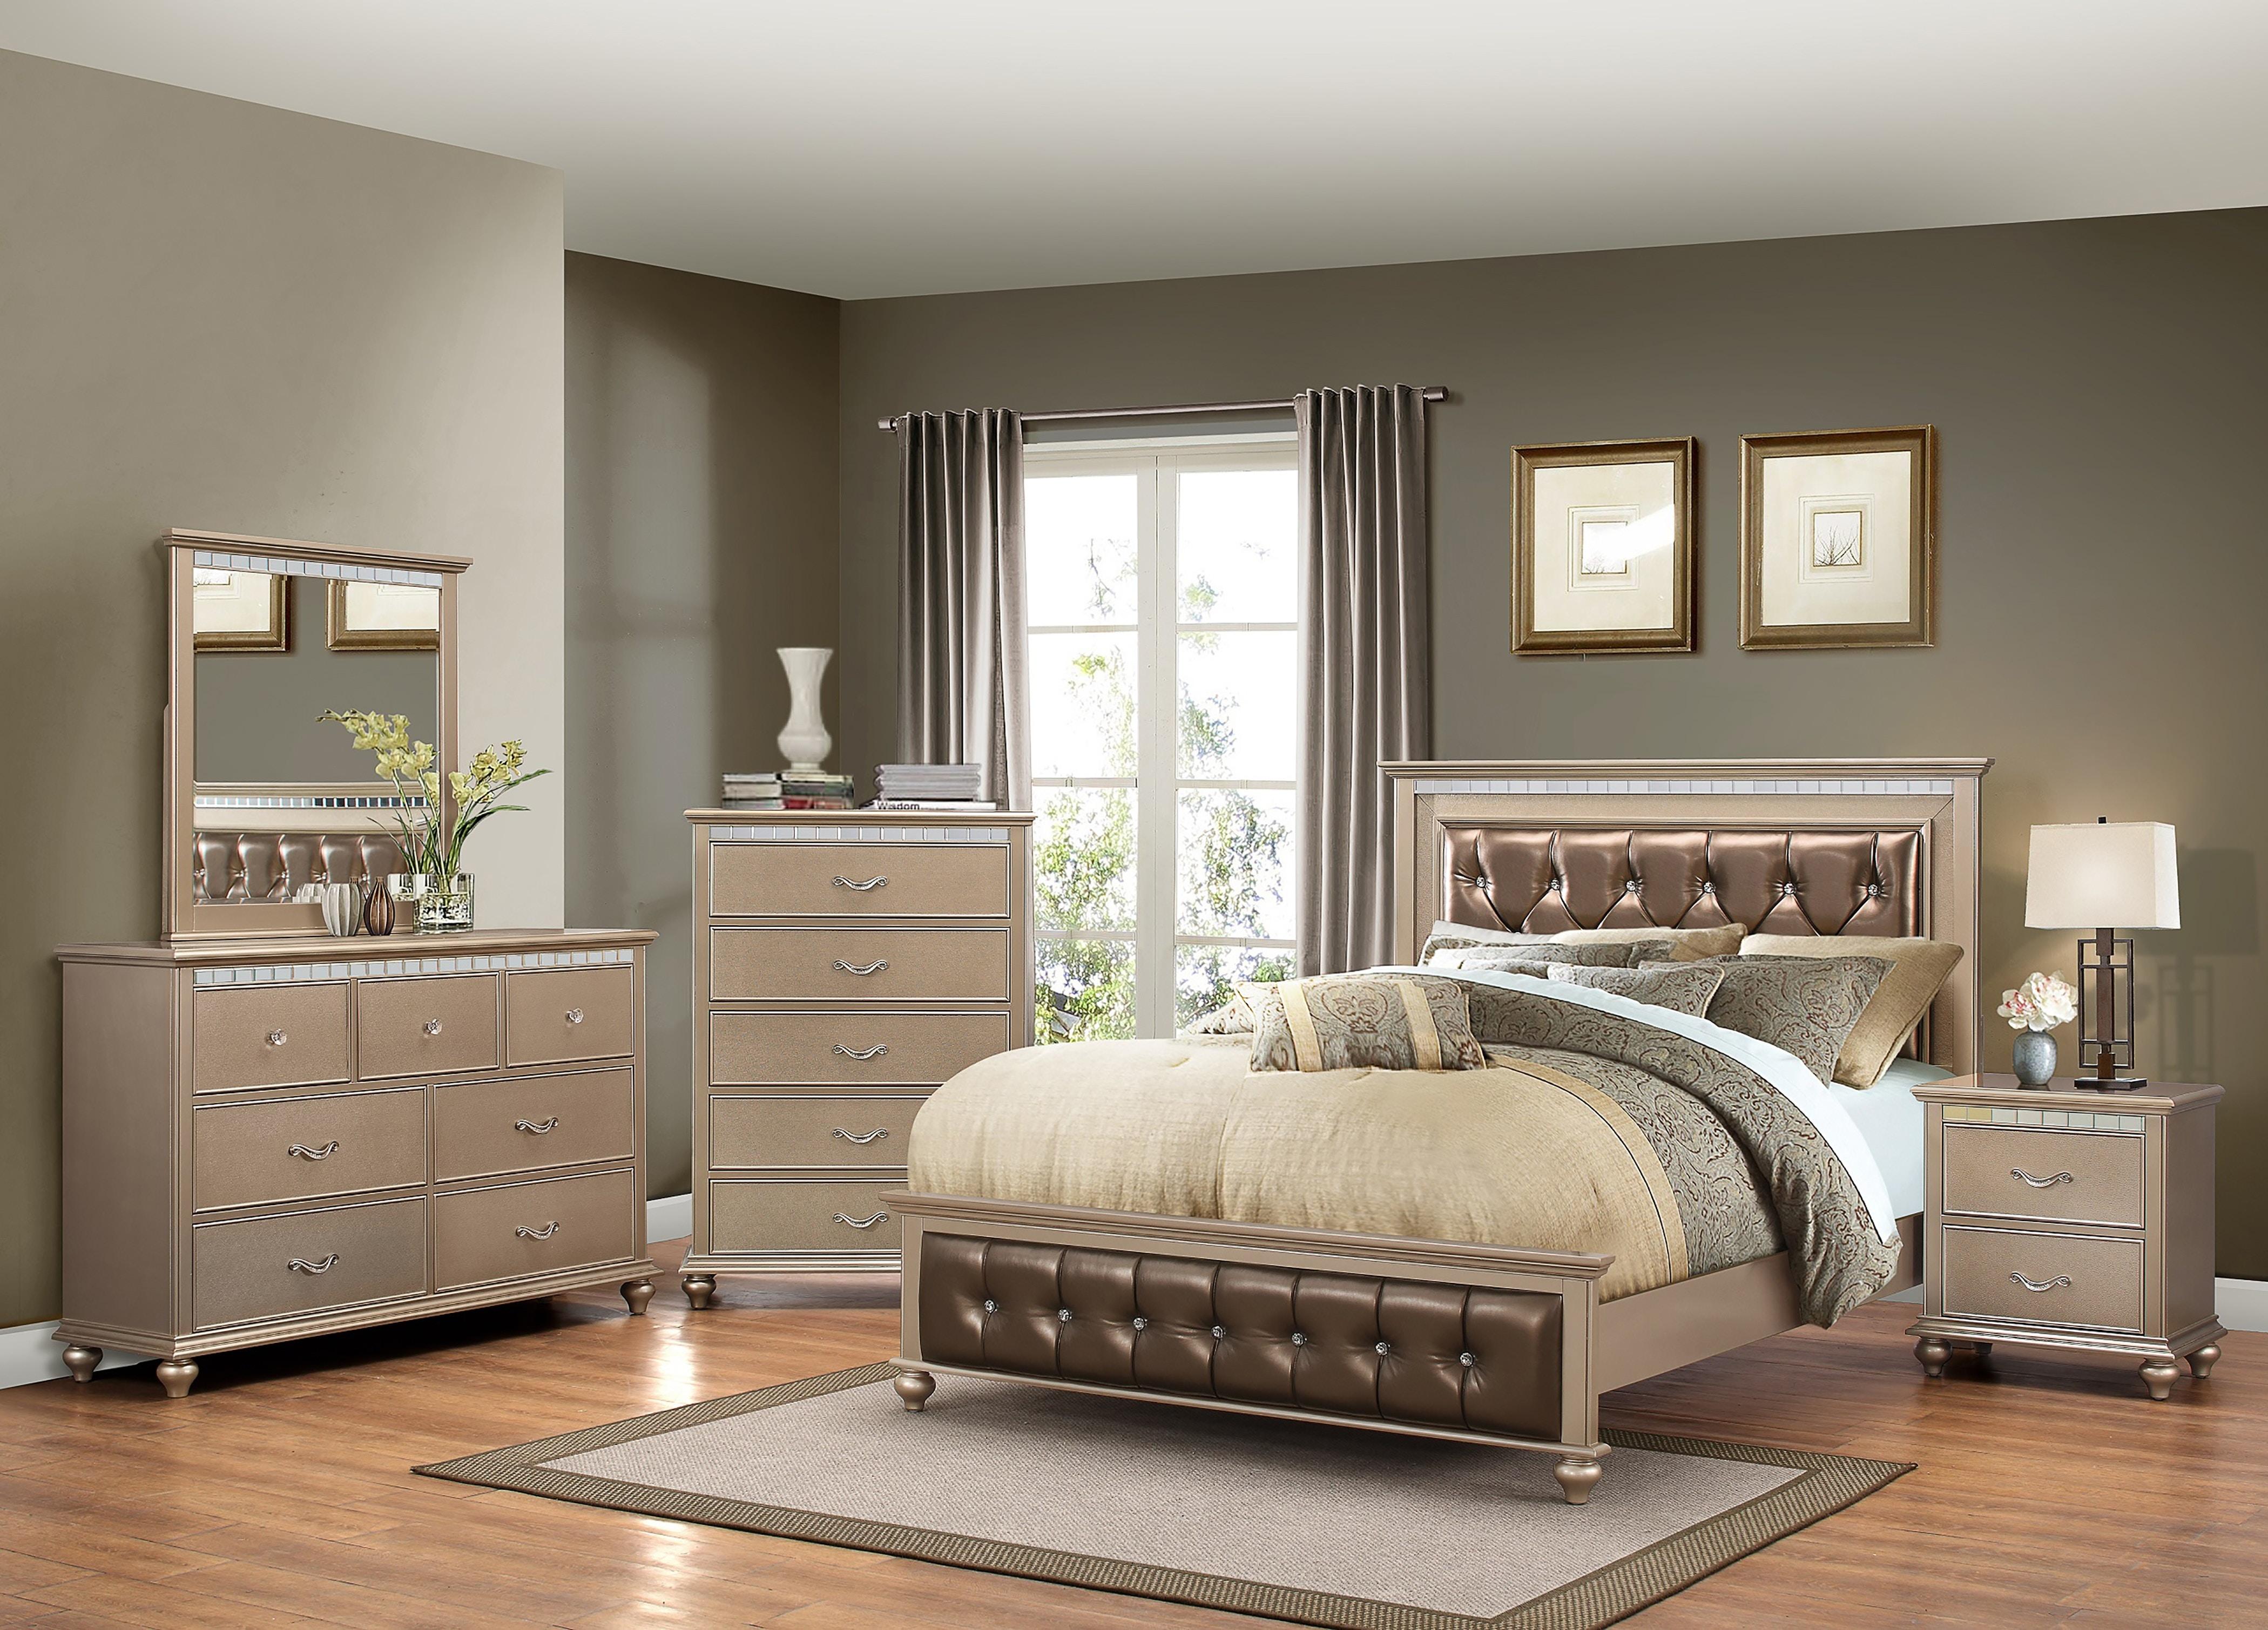 Master bedroom furniture sets Queen 1008q Dresser Mirror Queen Bed Set Elgin Furniture Bedroom Master Bedroom Sets Elgin Furniture Cleveland Oh